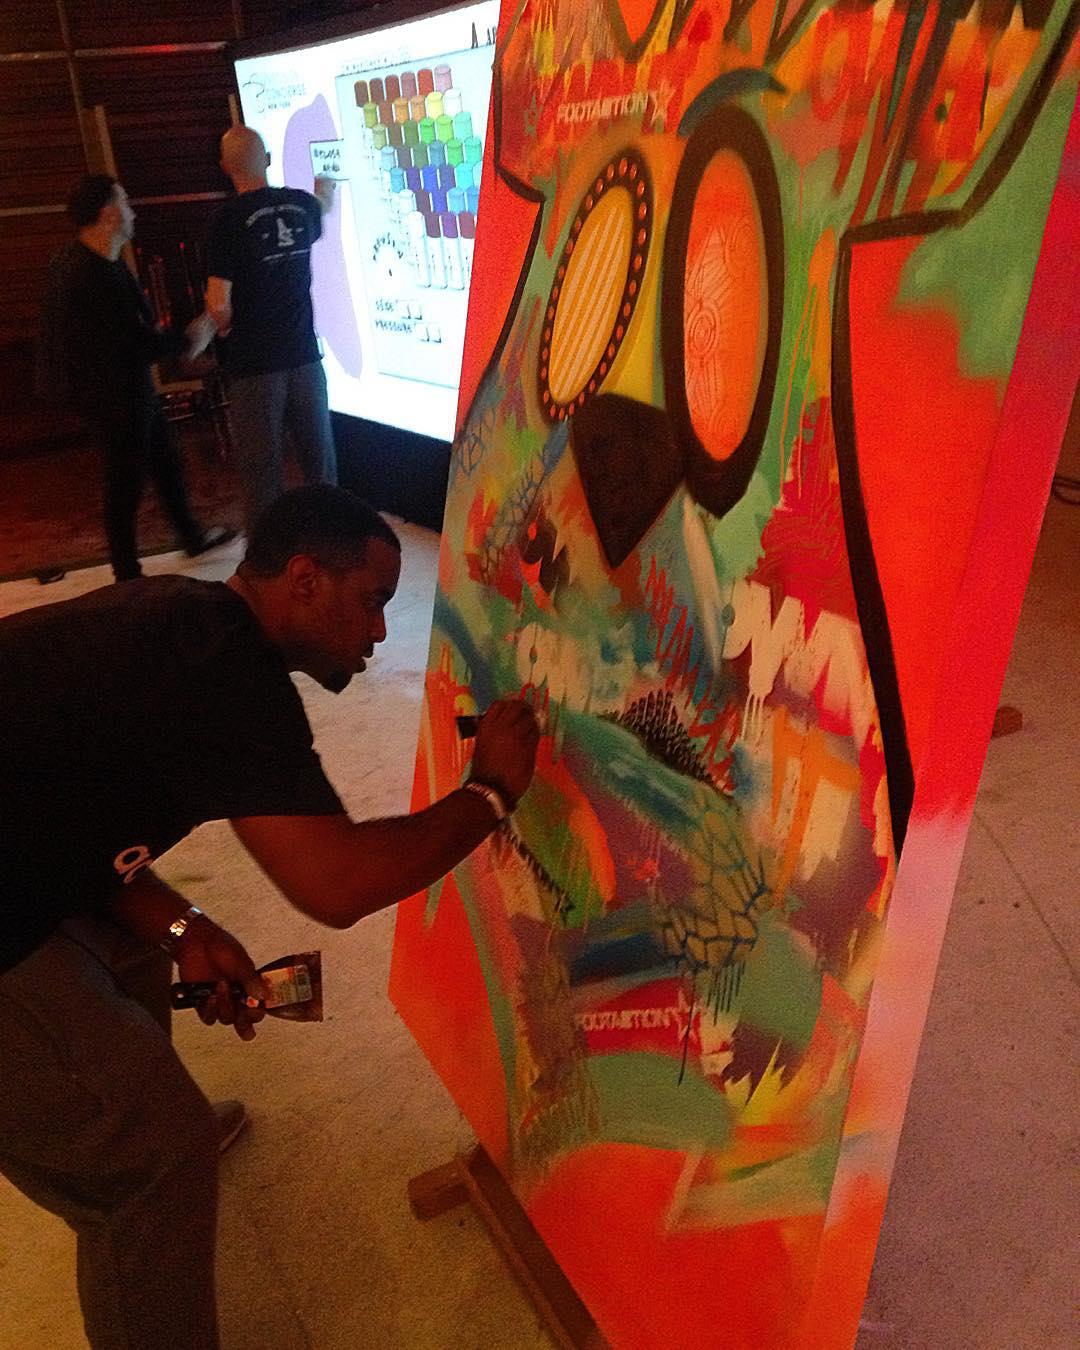 @kingsaladeen • • Art Basel #wynwood #miami • • #art #streetart #basel #spratx